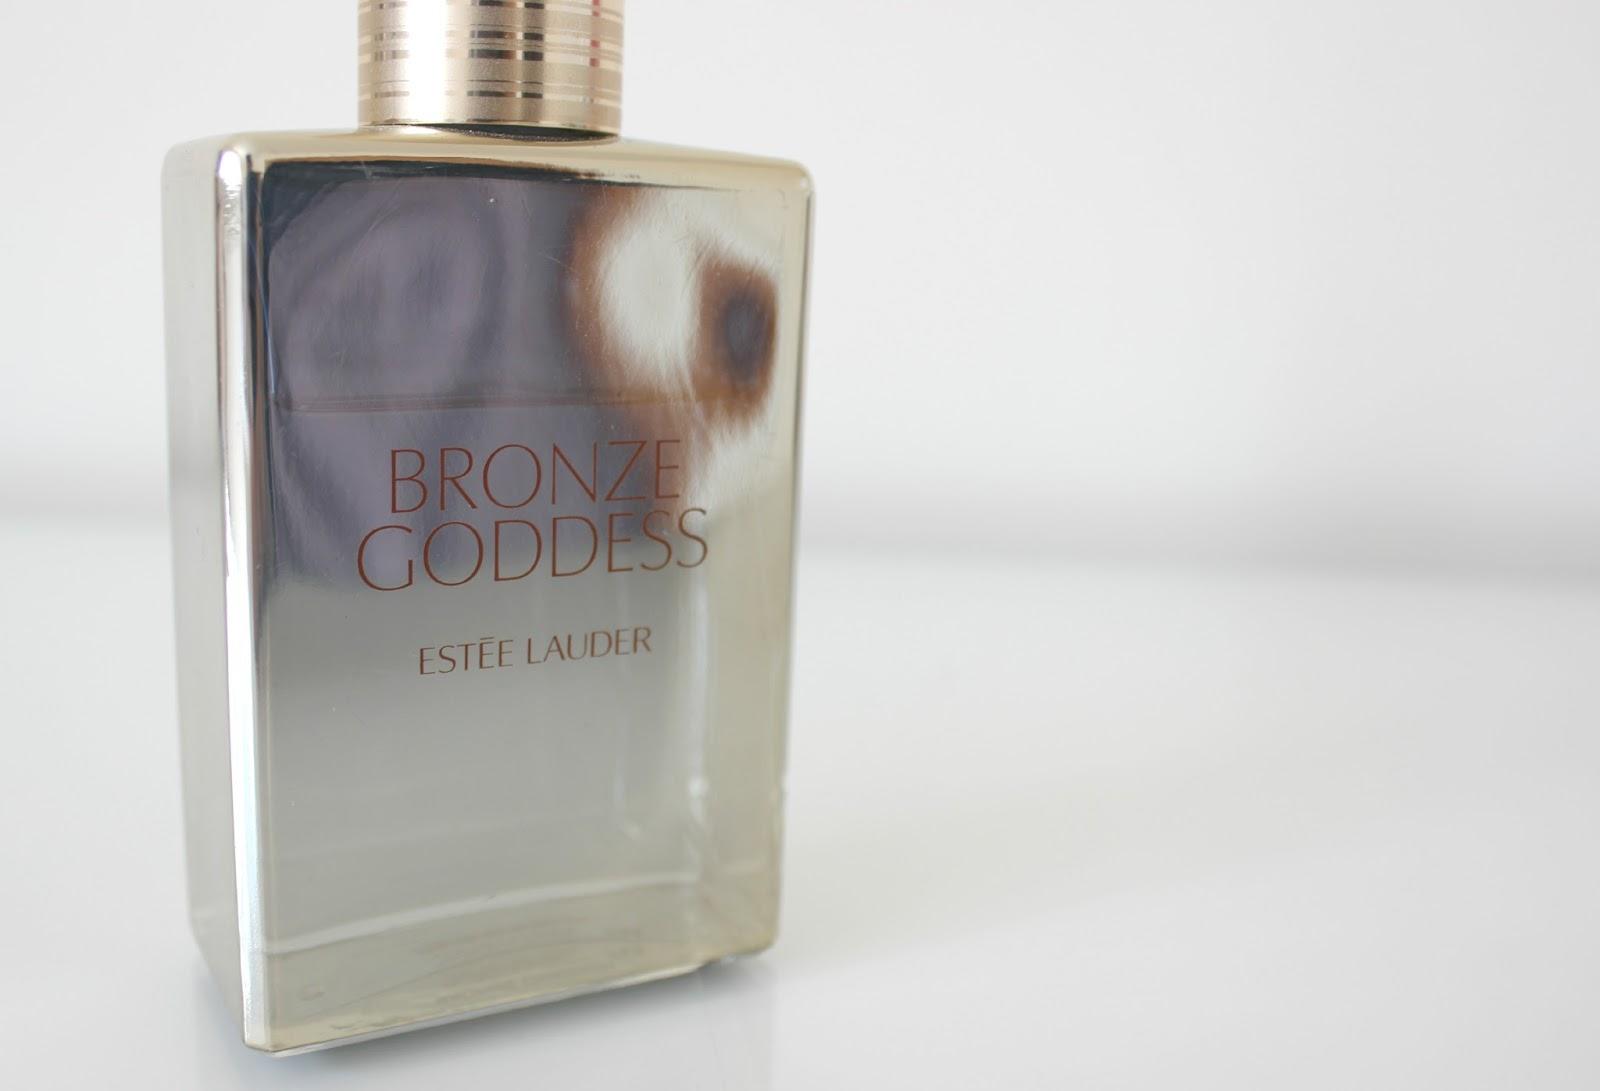 A picture of Estee Lauder Bronze Goddess Eau Fraiche Skinscent